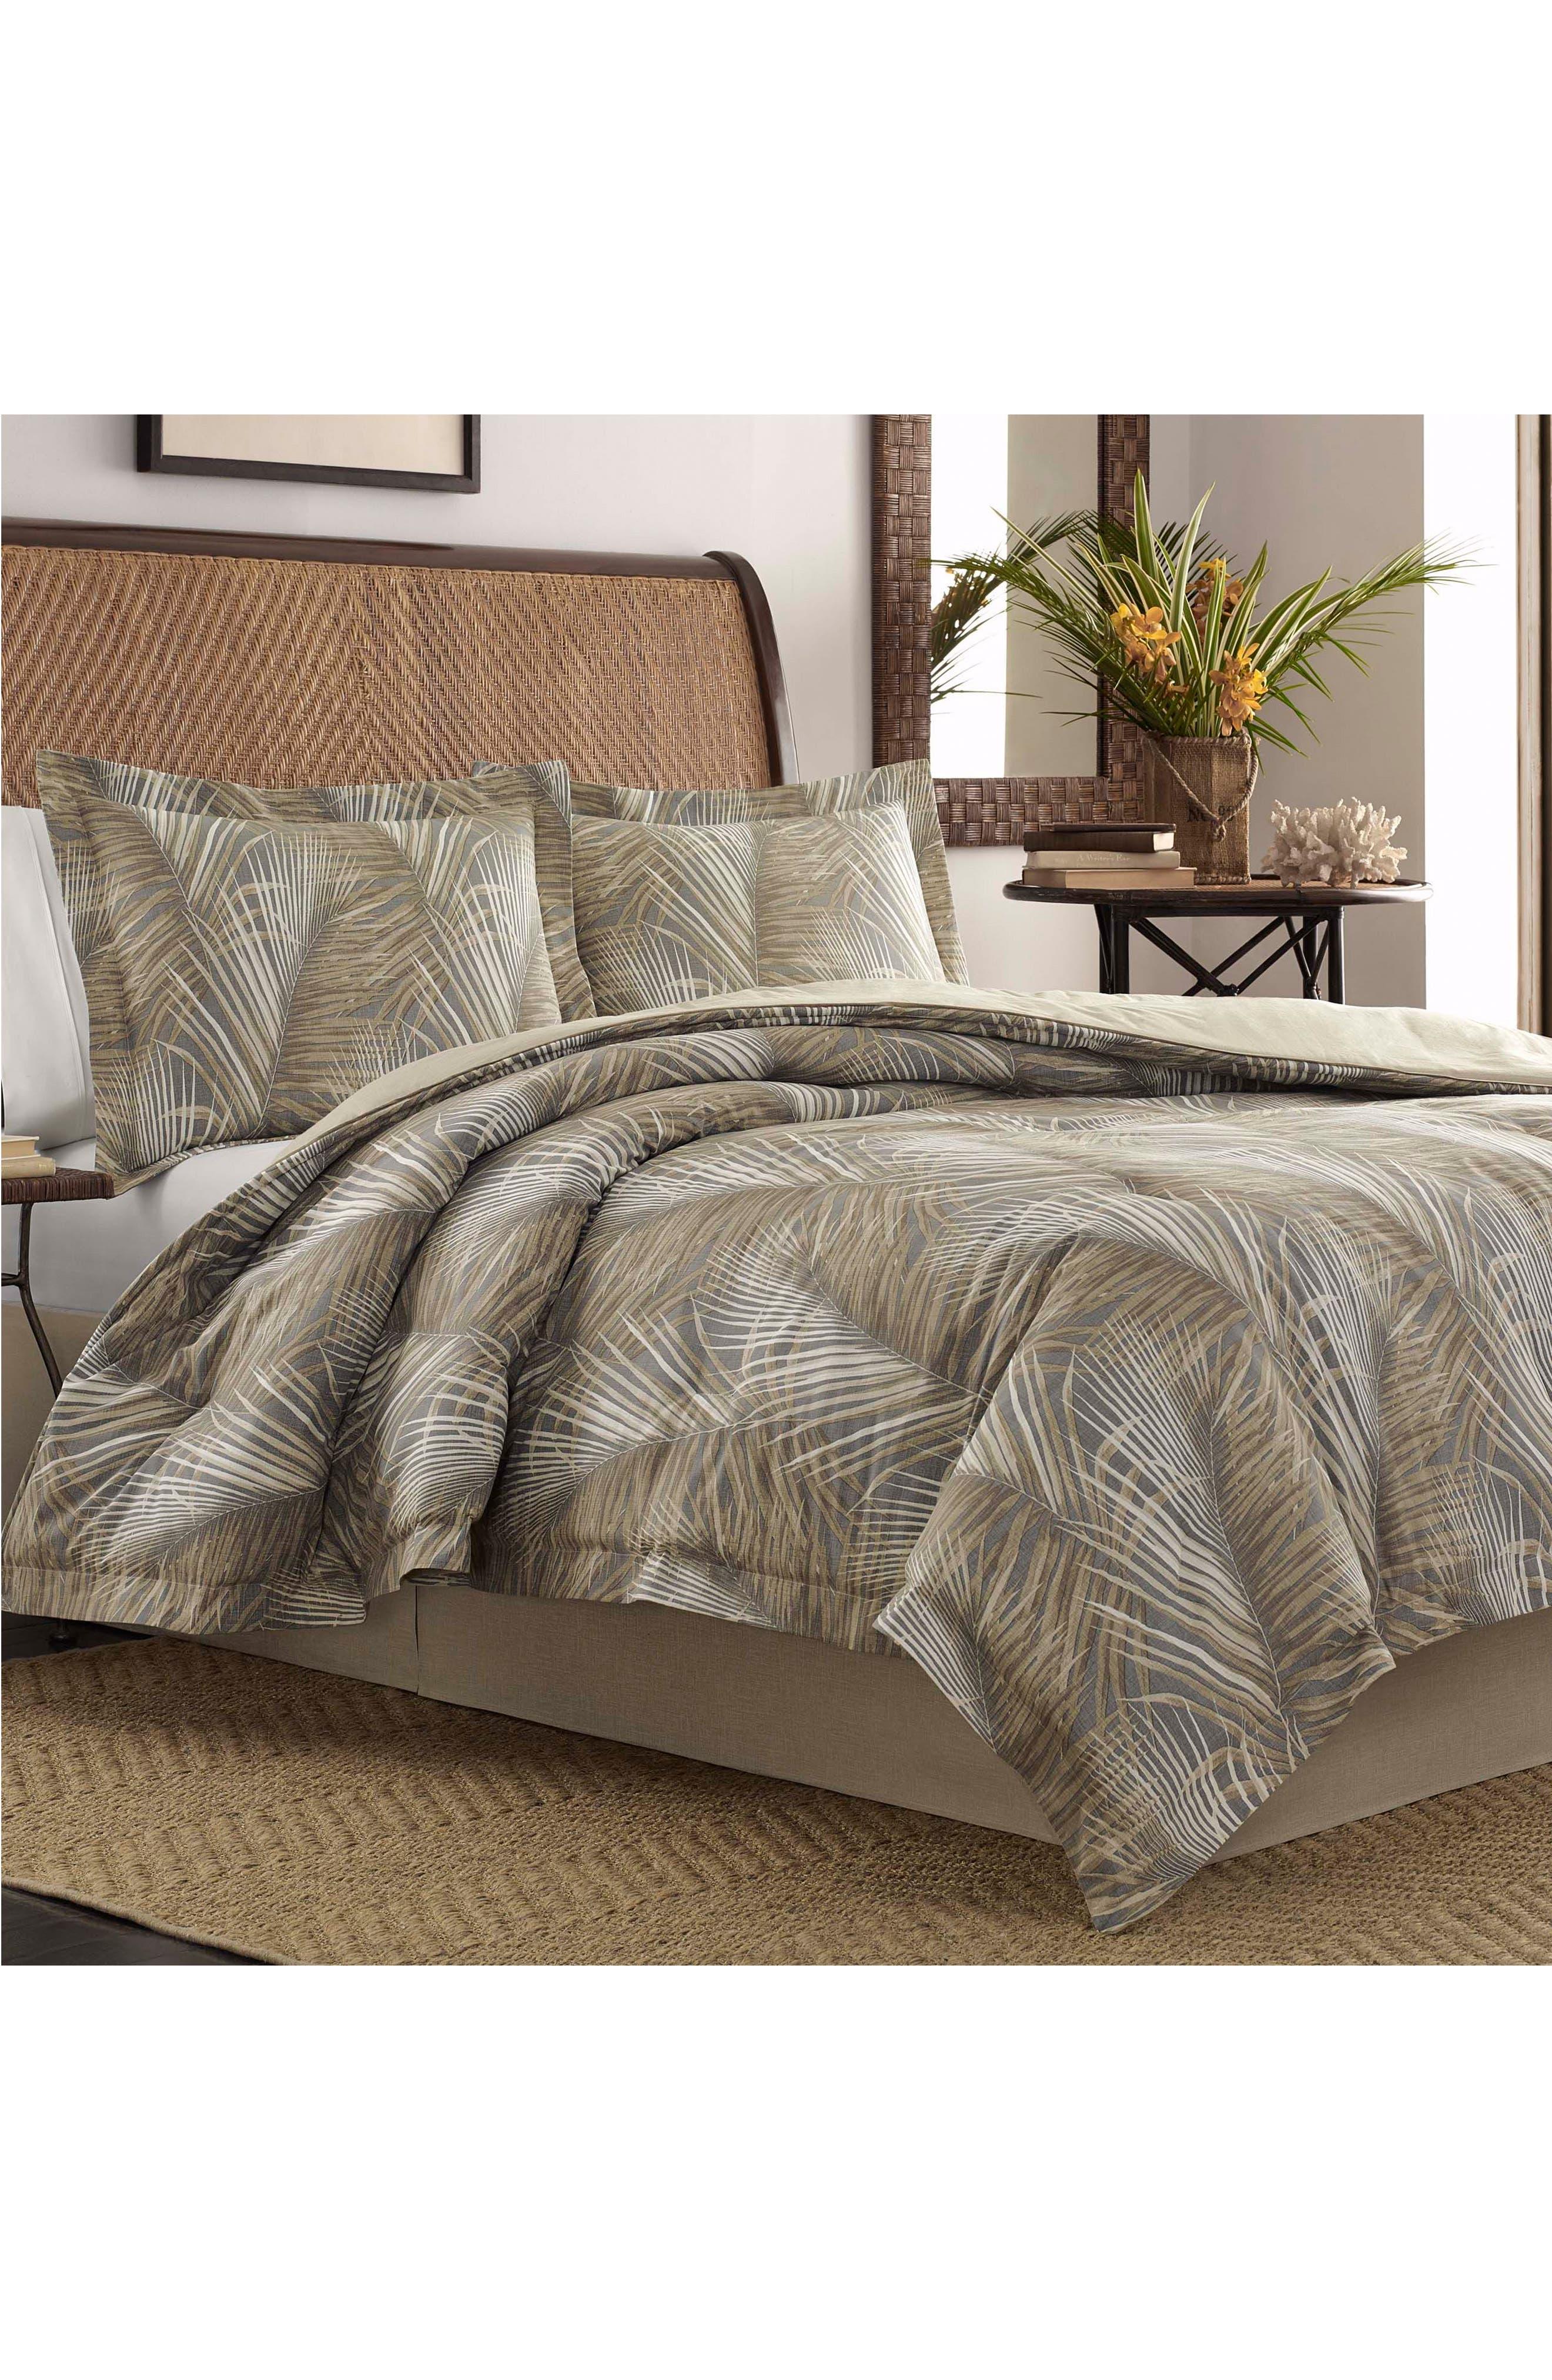 Main Image - Tommy Bahama Raffia Palms Comforter & Sham Set